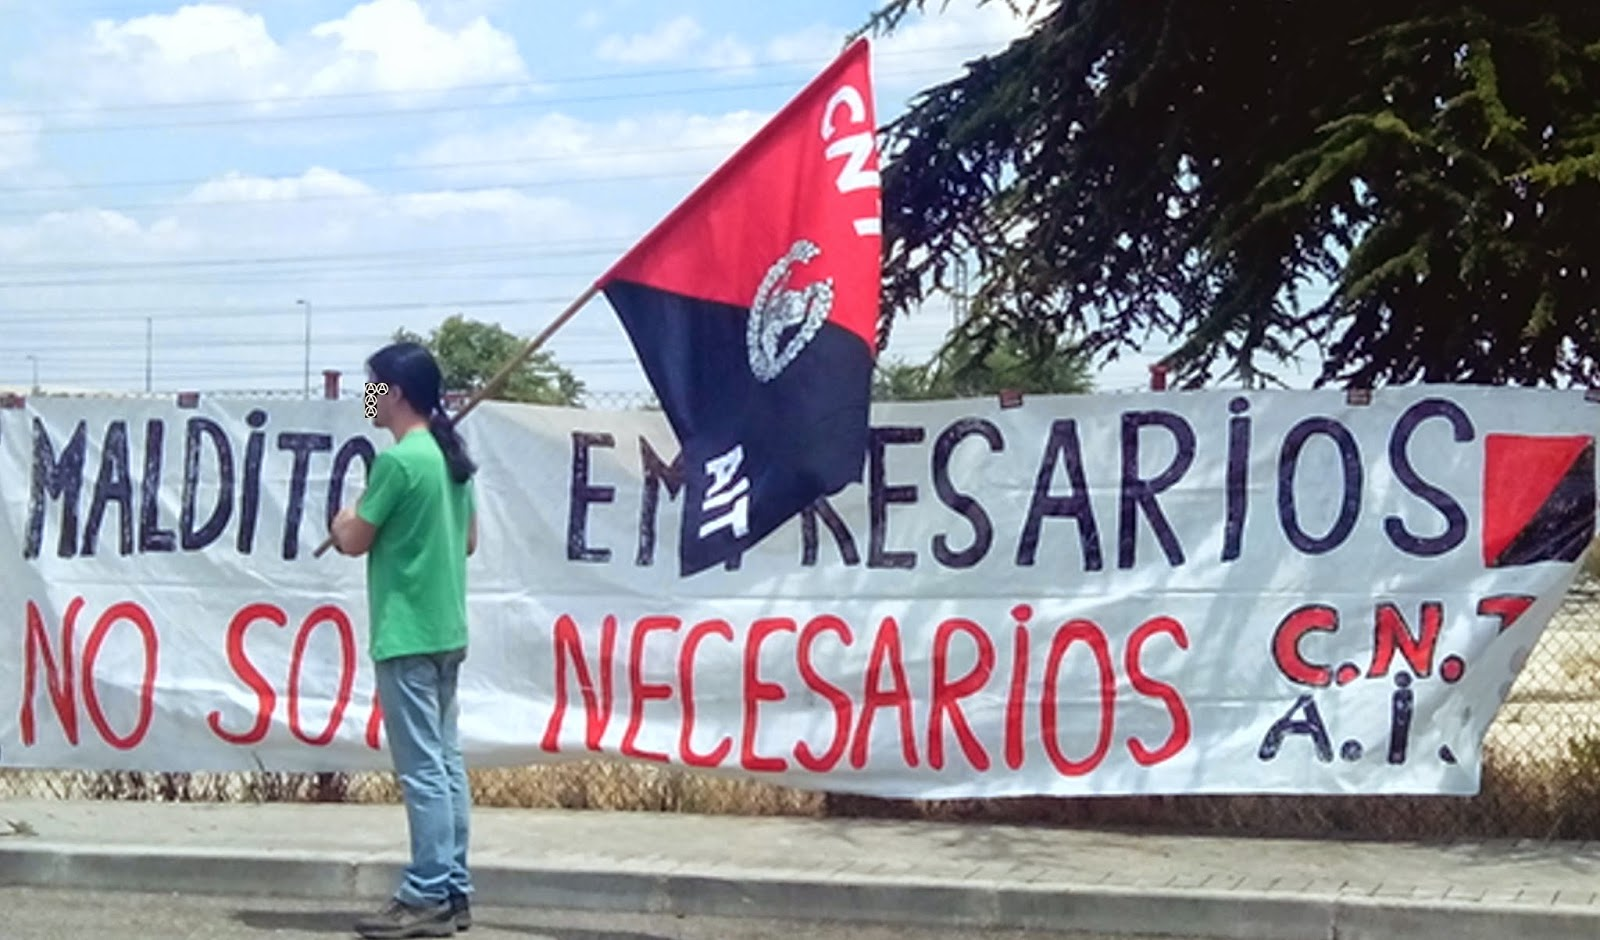 CNT AIT EN LUCHA CONTRA LOS DESPIDOS EN PORTINOX TEKA, Teka en Alcalá de Henares,trabajadores de Portinox, perteneciente al grupo Teka,la Asociación Internacional de Trabajadores,los anarquistas,frases anarquistas,los anarquistas,anarquista,anarquismo, frases de anarquistas,anarquia,la anarquista,el anarquista,a anarquista,anarquismo, anarquista que es,anarquistas,el anarquismo,socialismo,el anarquismo,o anarquismo,greek anarchists,anarchist, anarchists cookbook,cookbook, the anarchists,anarchist,the anarchists,sons anarchy,sons of anarchy, sons,anarchy online,son of anarchy,sailing,sailing anarchy,anarchy in uk,   anarchy uk,anarchy song,anarchy reigns,anarchist,anarchism definition,what is anarchism, goldman anarchism,cookbook,anarchists cook book, anarchism,the anarchist cookbook,anarchist a,definition anarchist, teenage anarchist,against me anarchist,baby anarchist,im anarchist, baby im anarchist, die anarchisten,frau des anarchisten,kochbuch anarchisten, les anarchistes,leo ferre,anarchiste,les anarchistes ferre,les anarchistes ferre, paroles les anarchistes,léo ferré,ferré anarchistes,ferré les anarchistes,léo ferré,  anarchia,anarchici italiani,gli anarchici,canti anarchici,comunisti, comunisti anarchici,anarchici torino,canti anarchici,gli anarchici,communism socialism,communism,definition socialism, what is socialism,socialist,socialism and communism,CNT,CNT, Confederación Nacional del Trabajo, AIT, La Asociación Internacional de los Trabajadores, IWA,International Workers Association,FAU,Freie Arbeiterinnen und Arbeiter-Union,FORA,F.O.R.A,Federación Obrera Regional Argentina,COB,Confederação Operária Brasileira ,Priama Akcia,CNT,Confédération Nationale du Travail,USI,Unione Sindacale Italiana,  NSF iAA,Norsk Syndikalistisk Forbund,ZSP,Zwiazek Syndykalistów Polski,AIT-SP,AIT Secção Portuguesa,solfed,Solidarity,inicijativa,Sindikalna konfederacija Anarho-sindikalisticka inicijativa, ASF,Anarcho-Syndicalist Federation,Grupo Germinal,CRA,Comisión de Relaciones